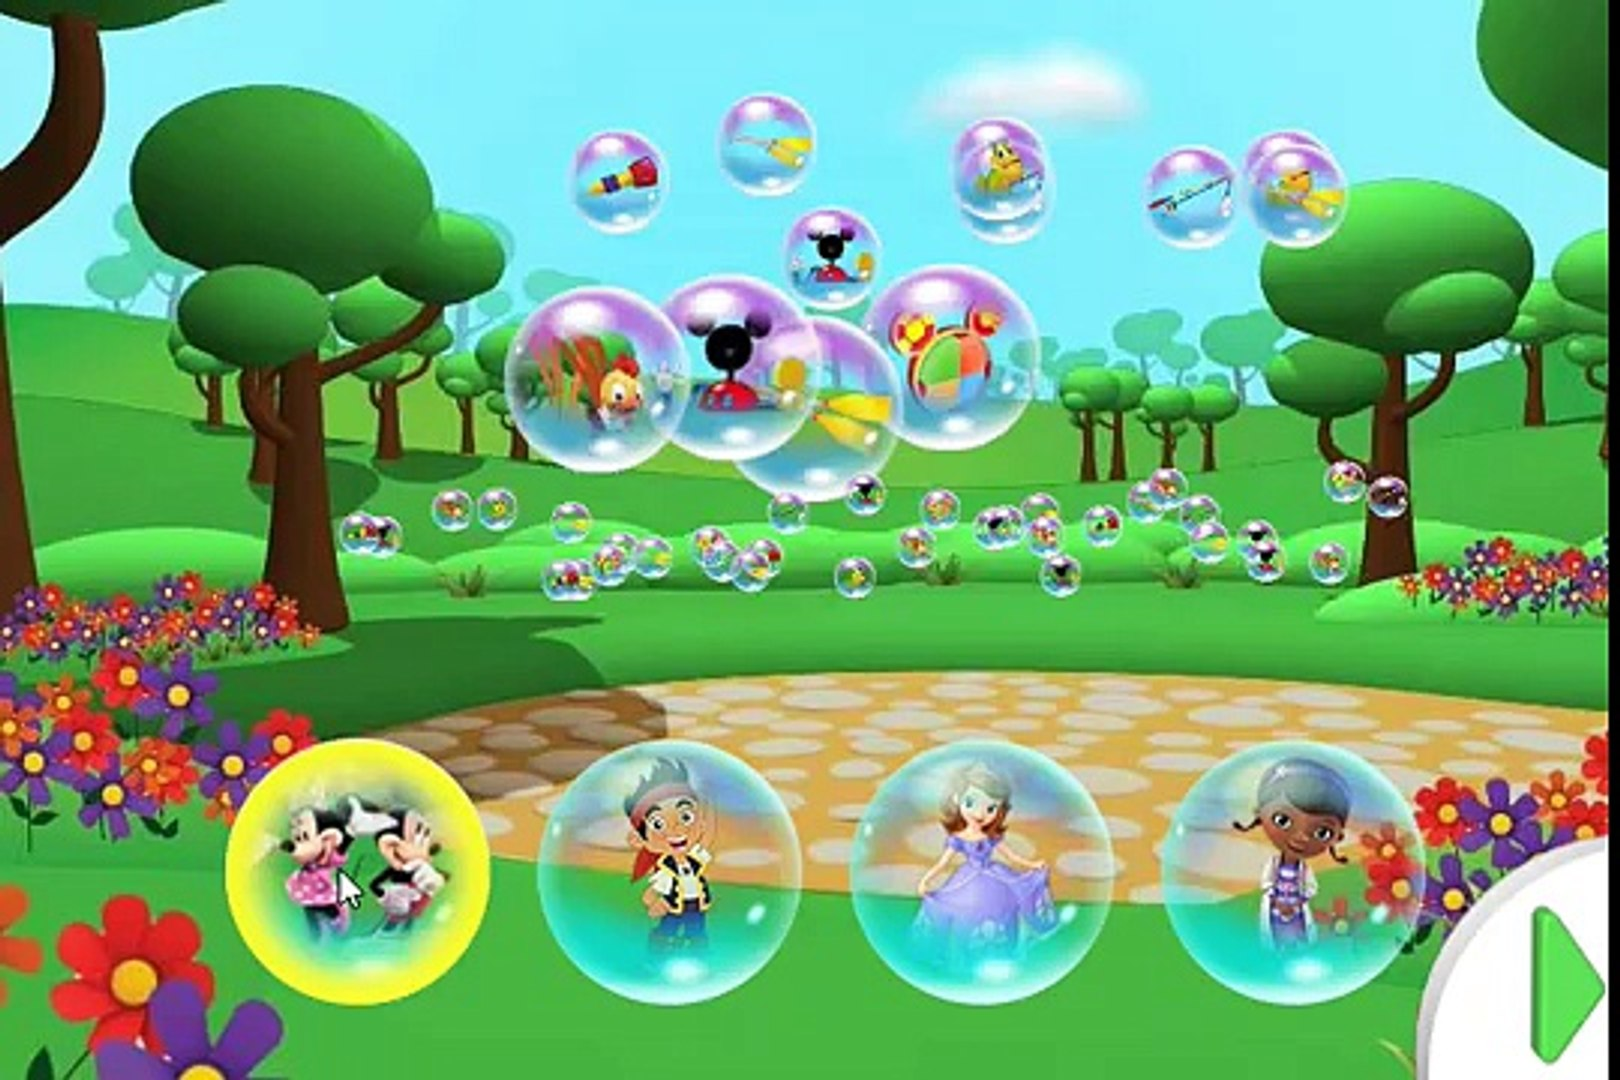 Mickey Mouse Clubhouse Mickey Mouse Clubhouse Happy Birthday Party Game Mickey Goofy Minnie Video Dailymotion